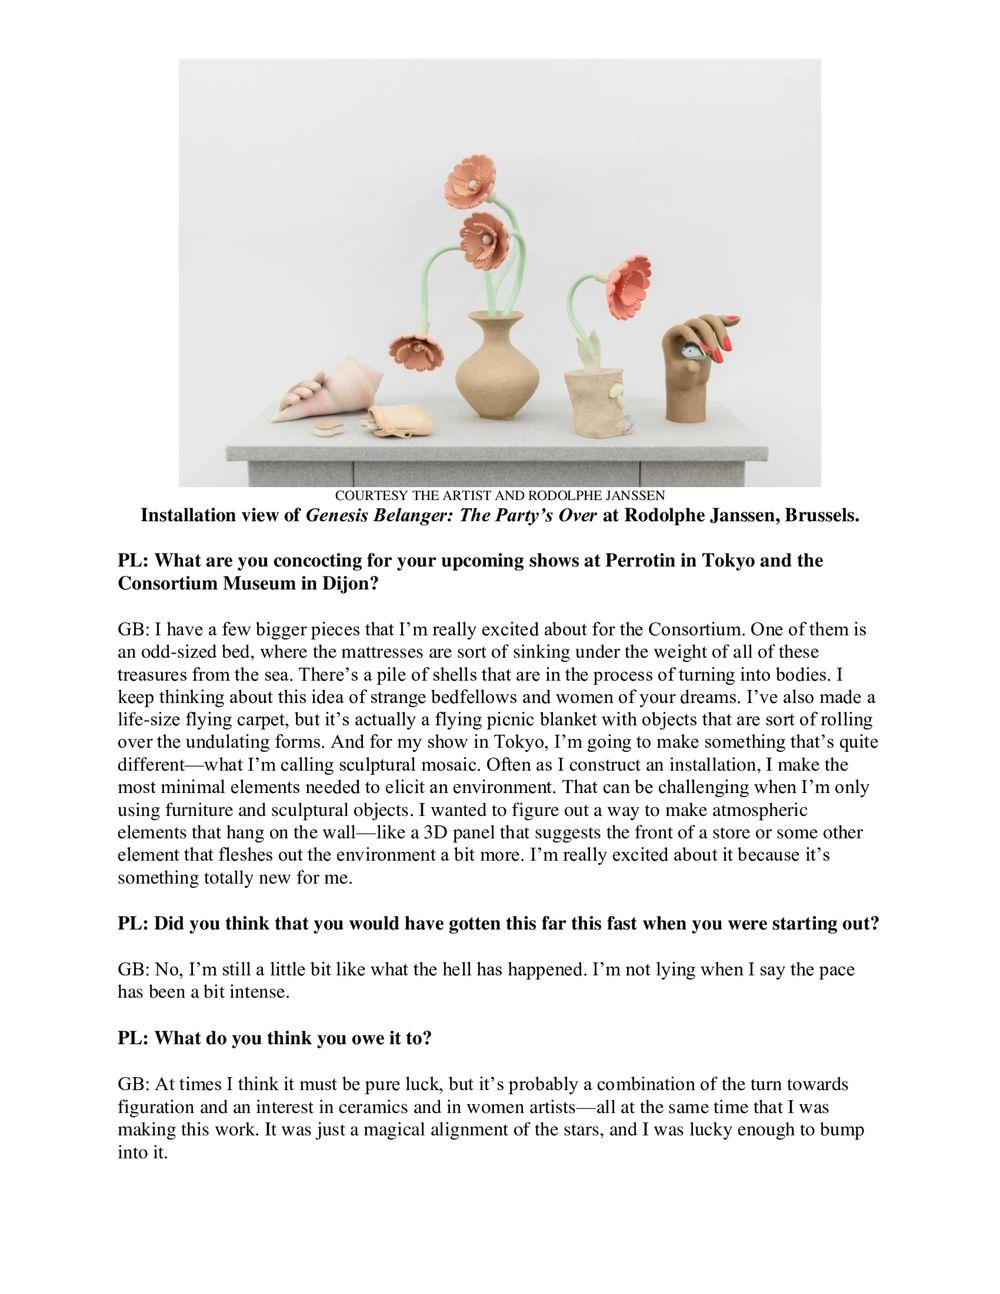 Art and Object | Genesis BELANGER